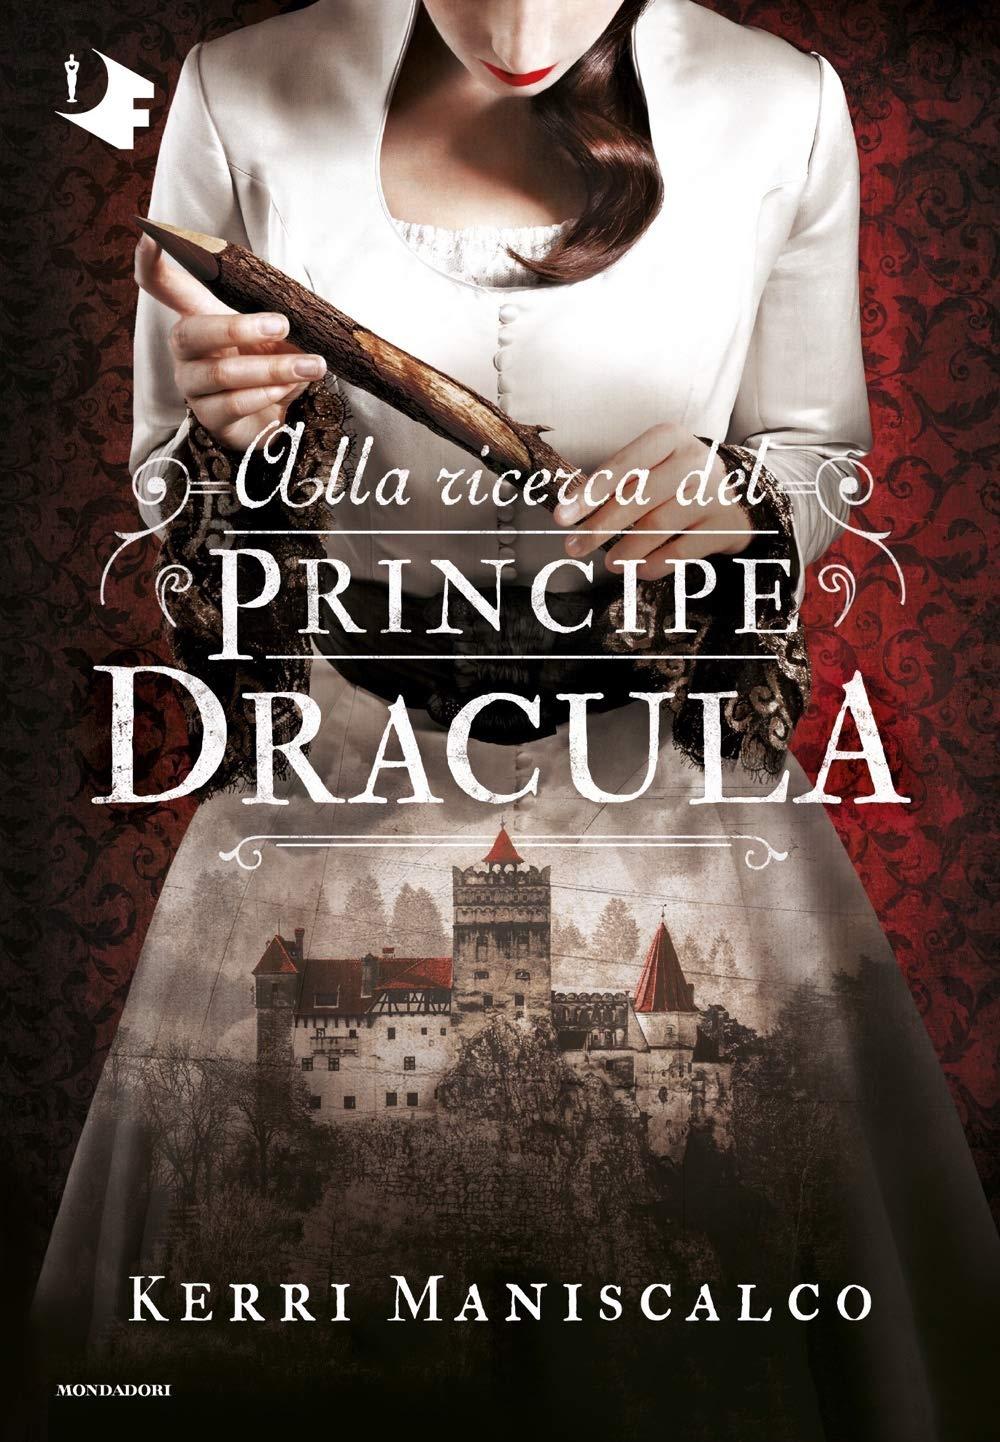 Alla ricerca del Principe Dracula - Copertina